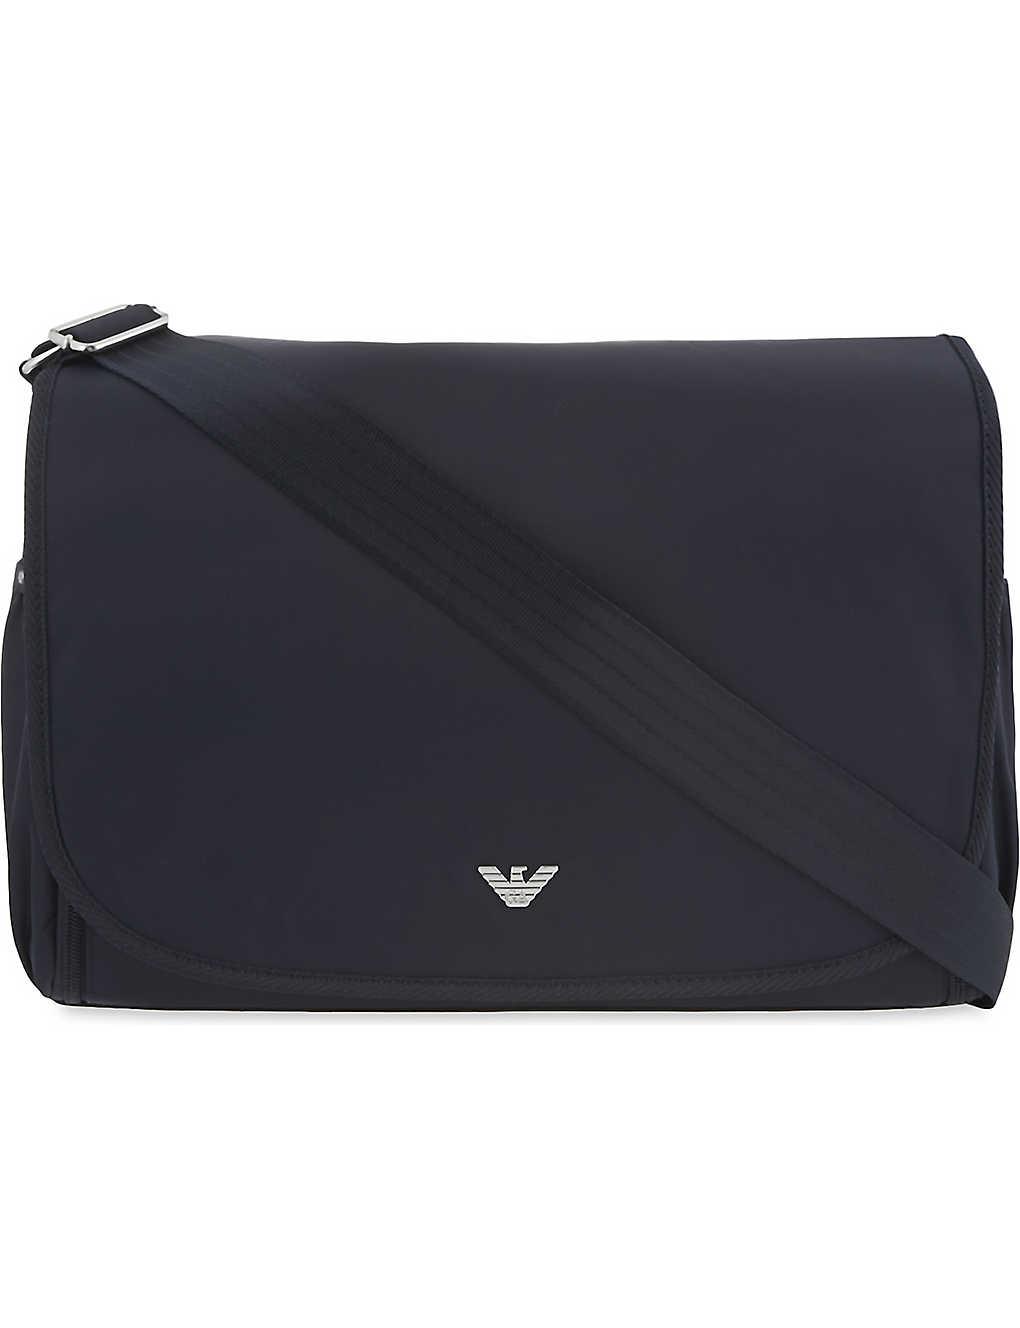 EMPORIO ARMANI - Changing bag  f8b28cc225d2a